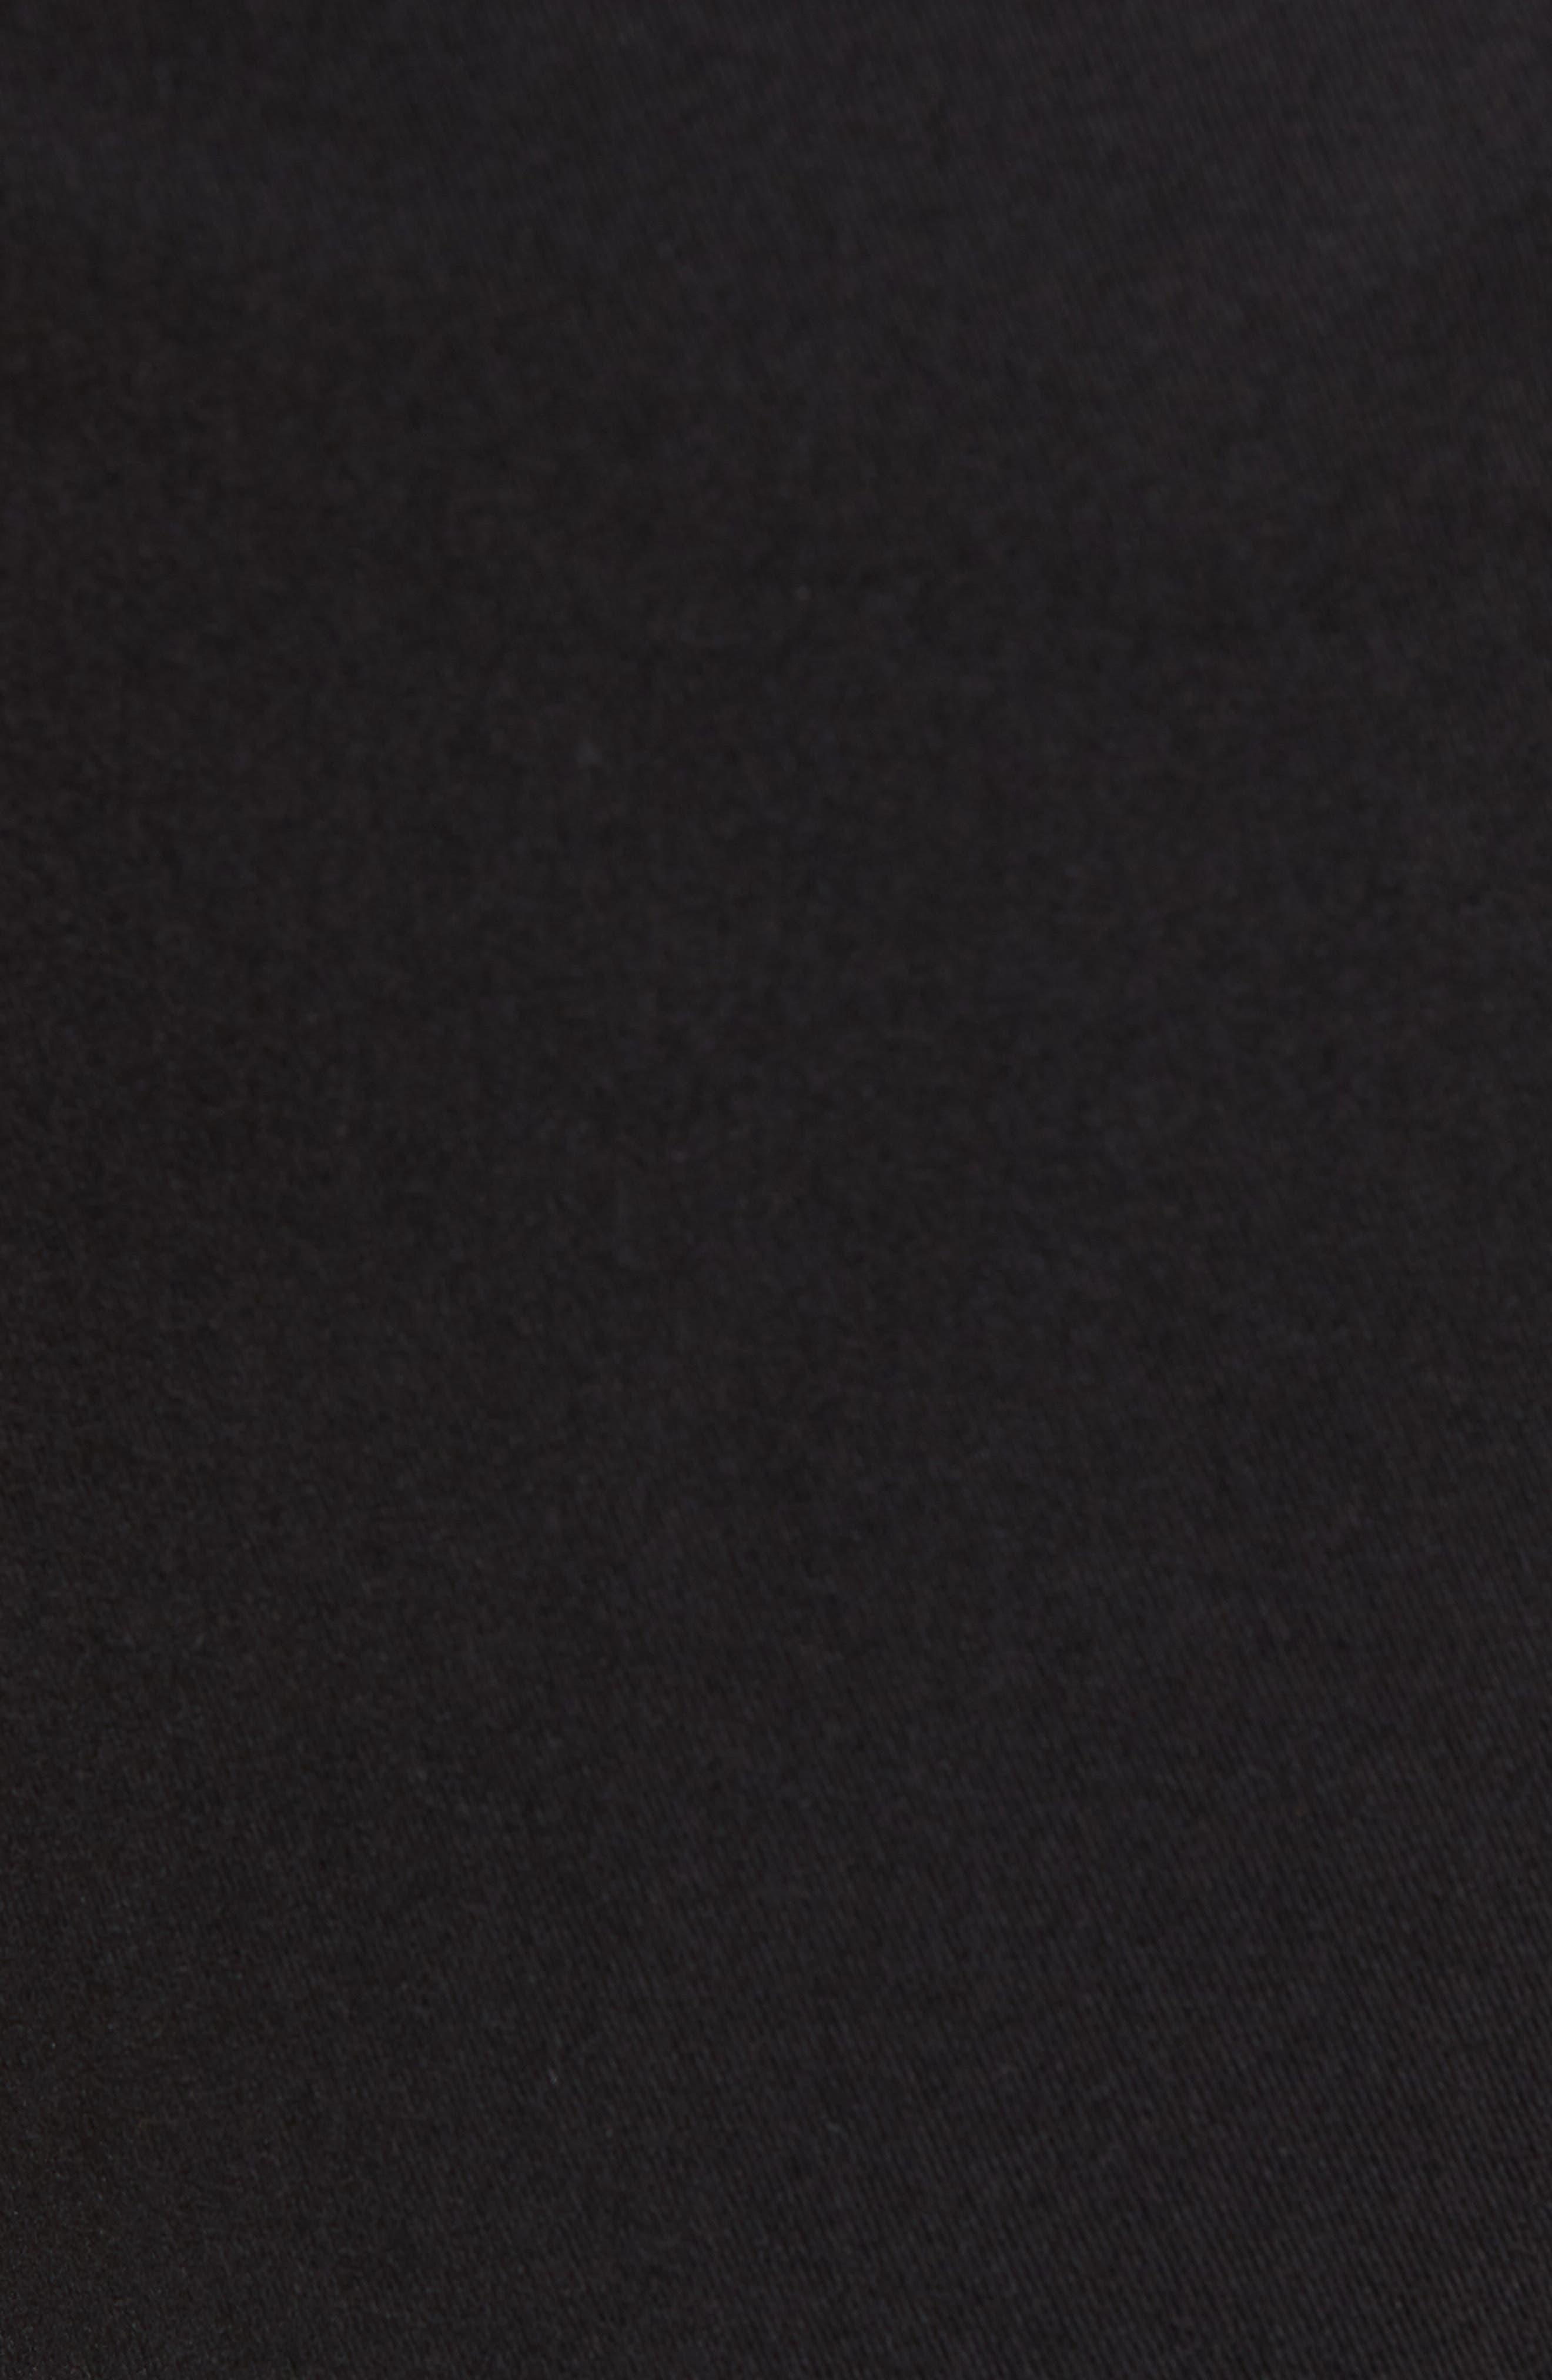 Creston Twill Shorts,                             Alternate thumbnail 5, color,                             001